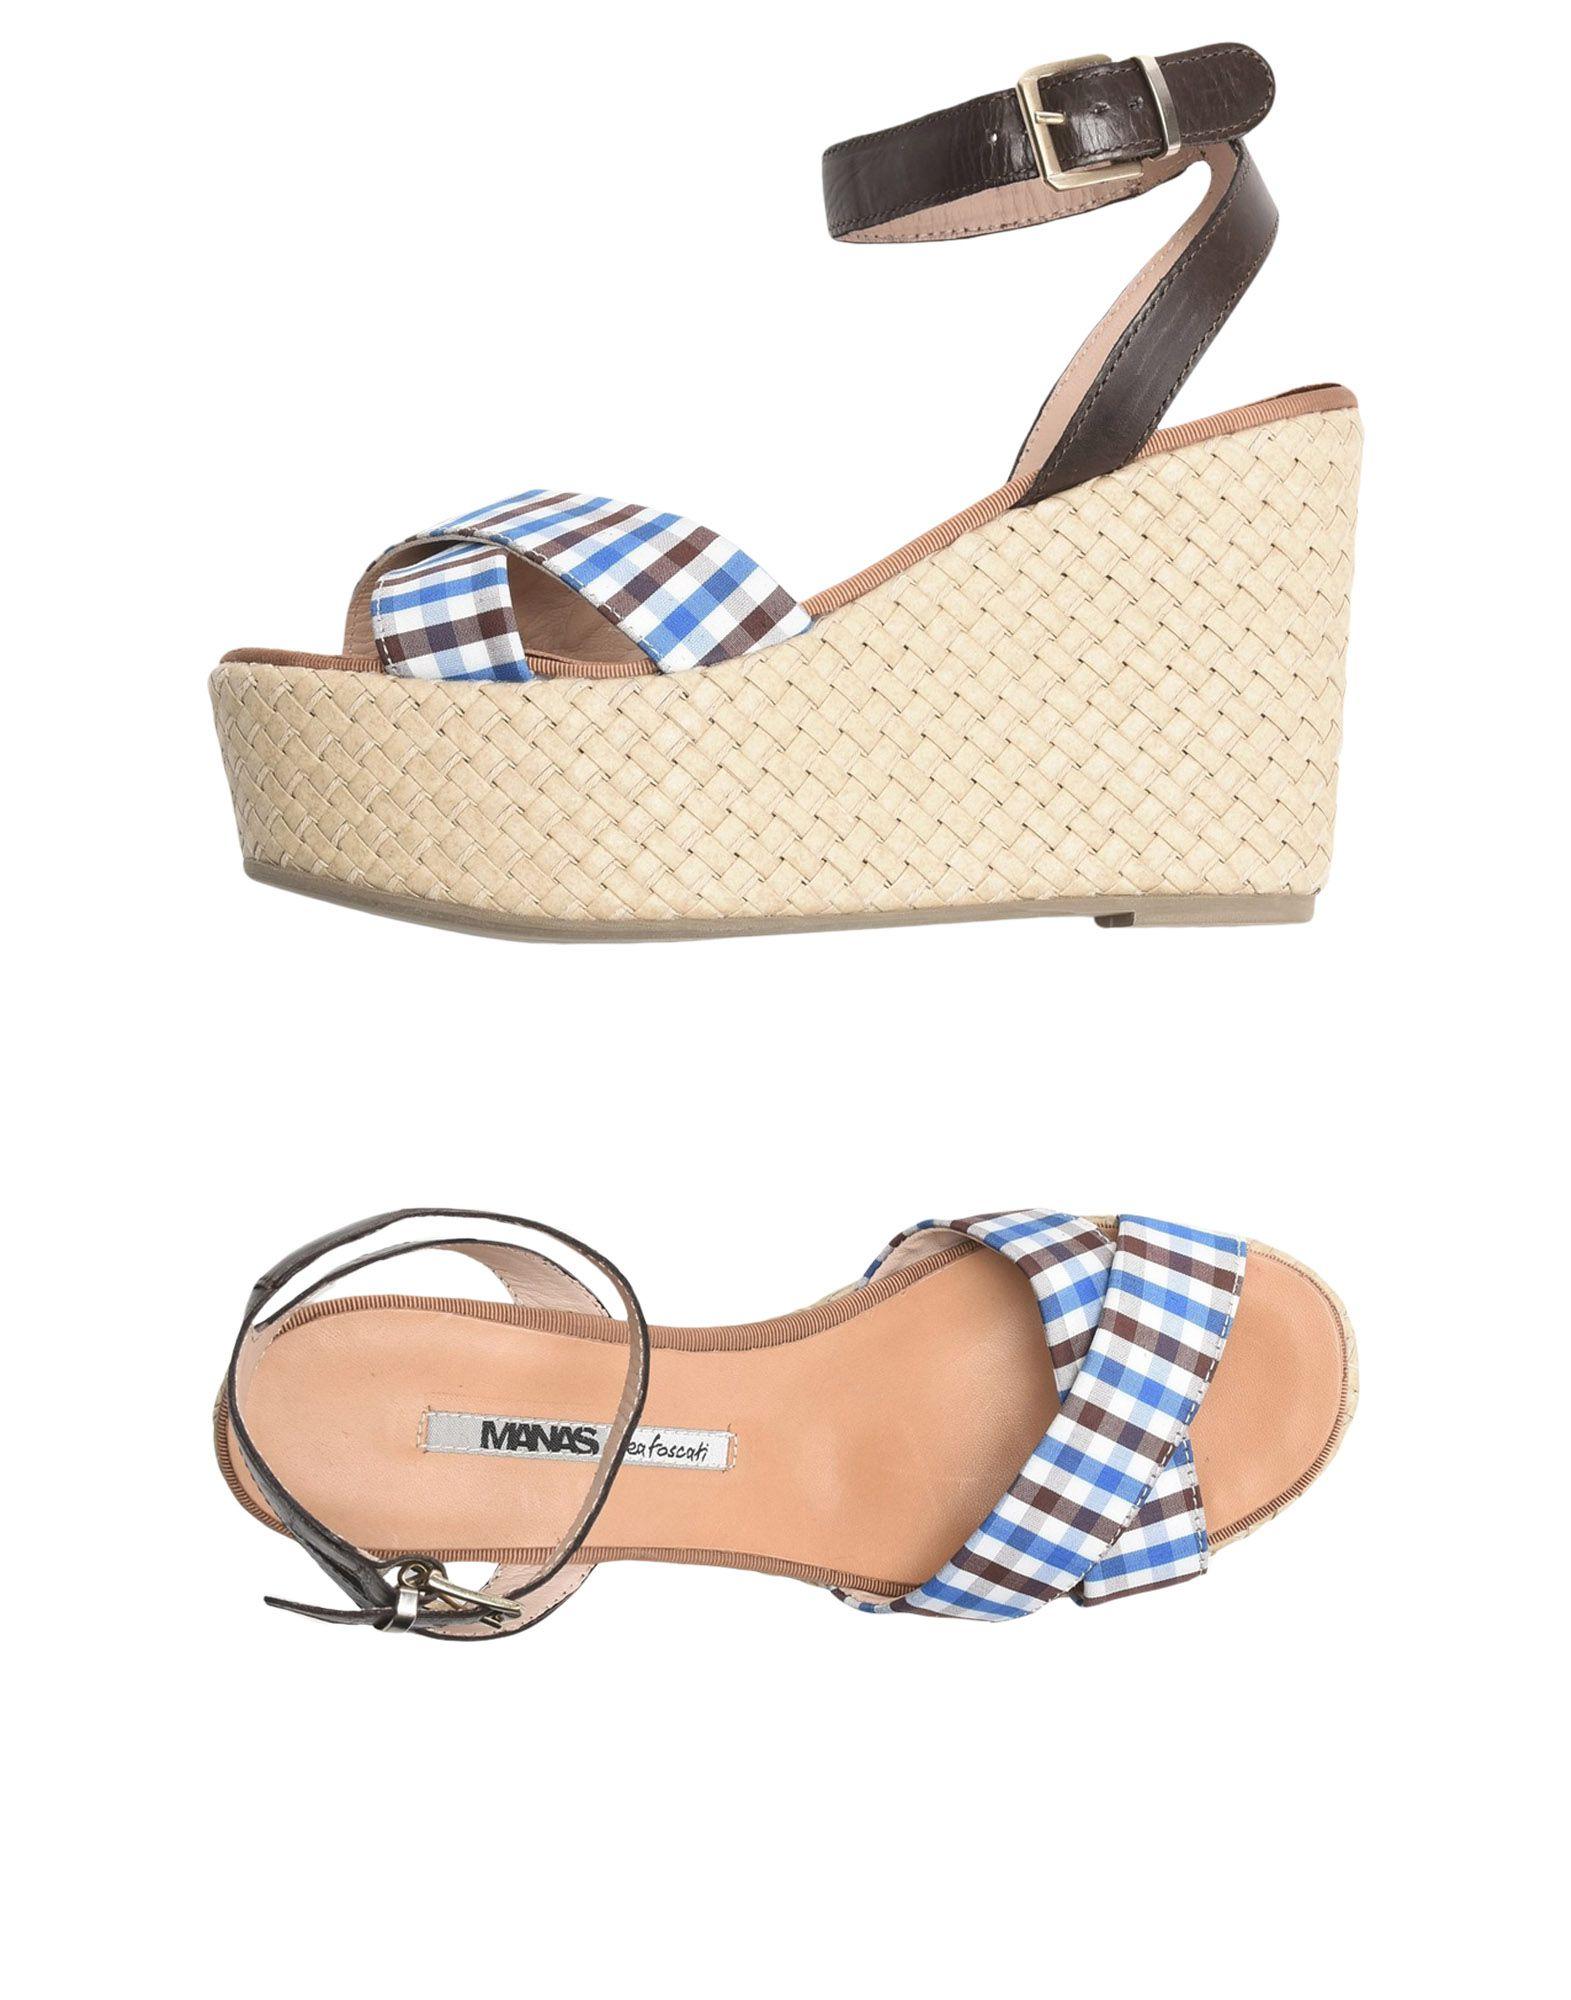 Manas Lea Foscati Sandals - Women Manas Lea  Foscati Sandals online on  Lea United Kingdom - 11500936WE a72cc9